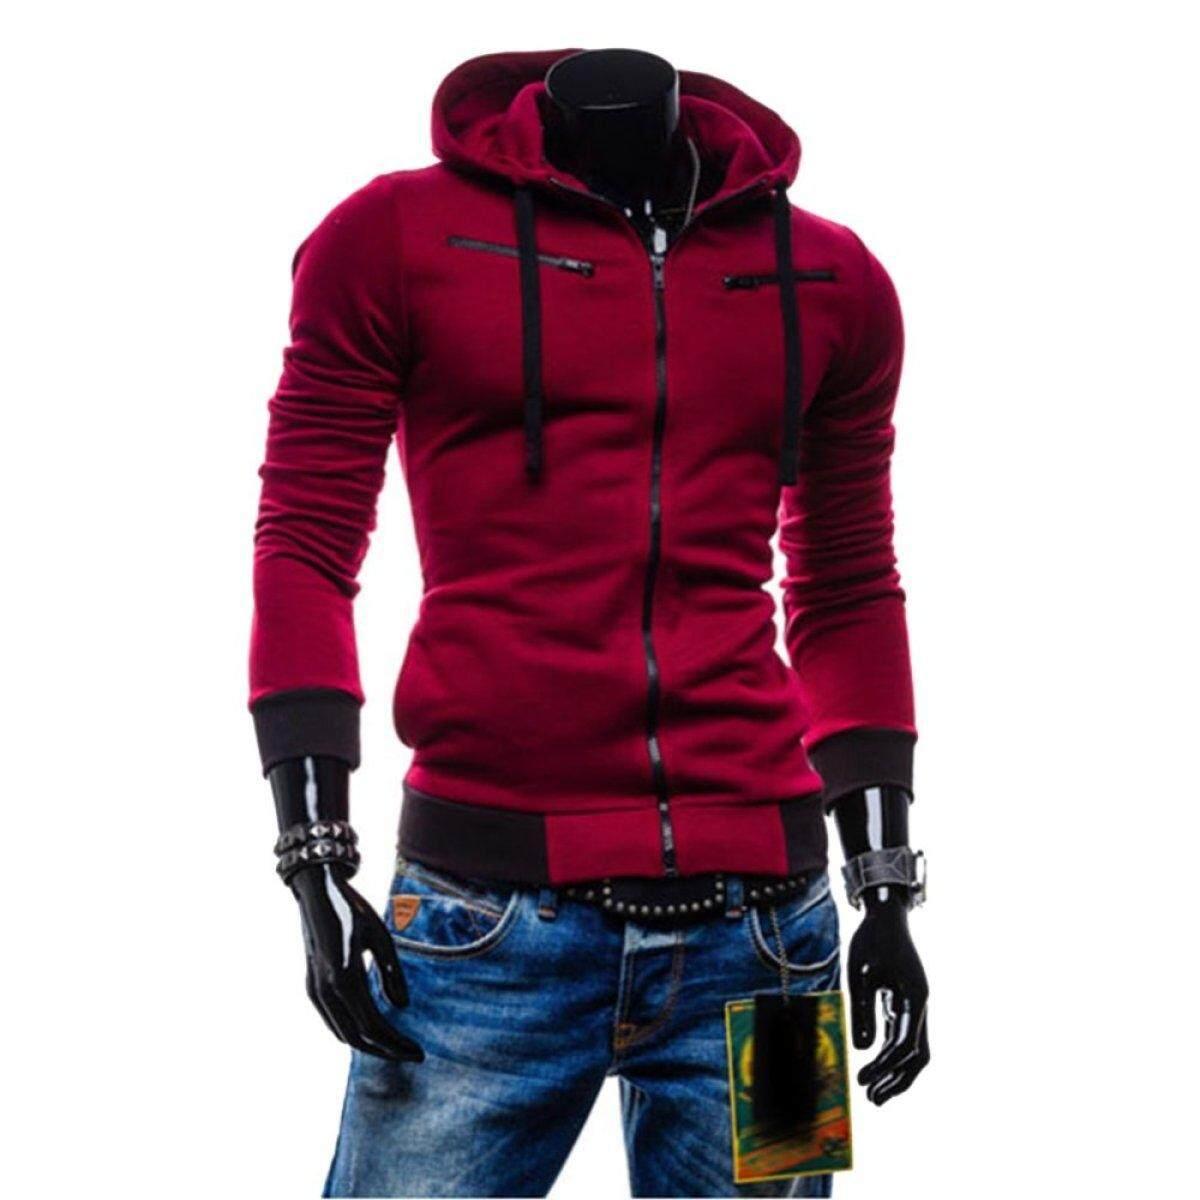 Cocotina Men Slim Fit Sweater Casual Zip Hooded Jacket Hoodie Coat (Wine Red)